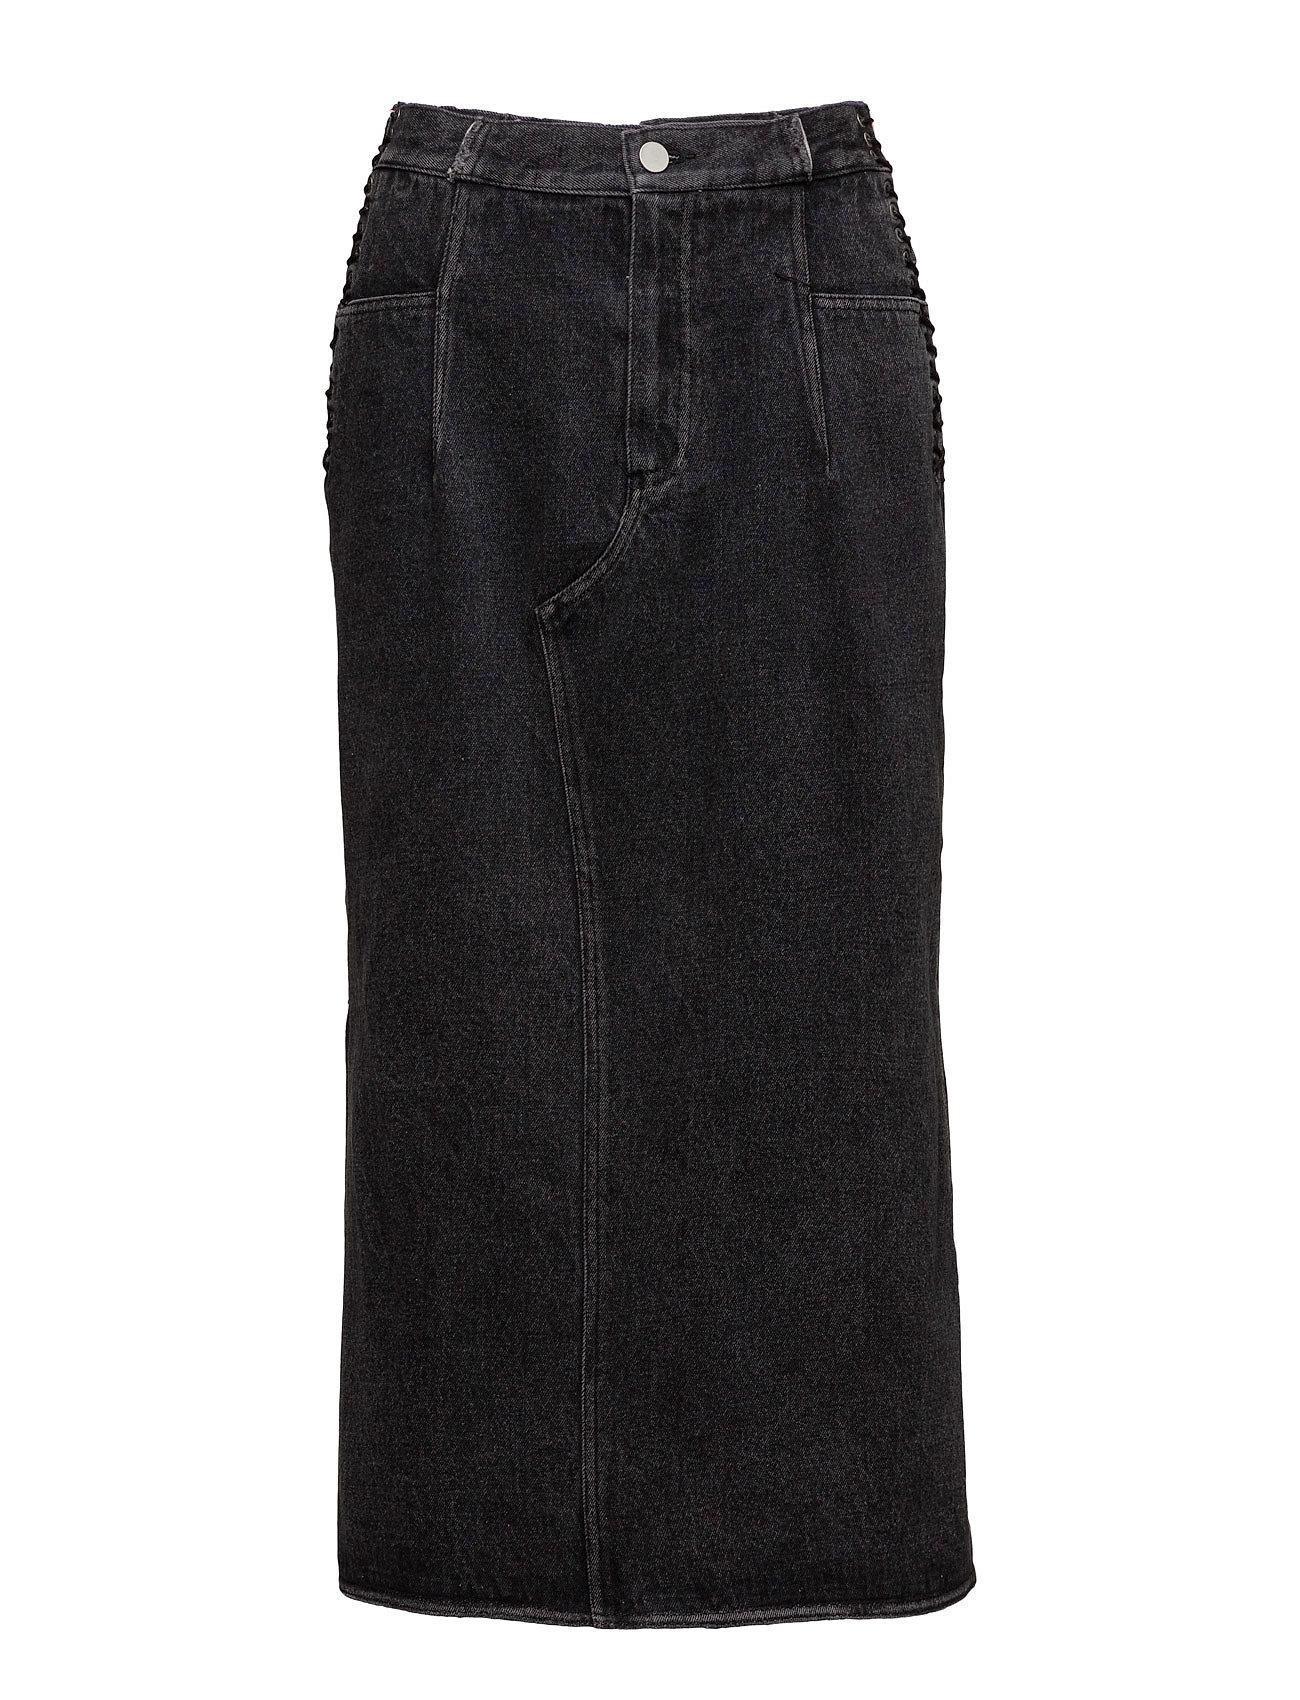 3.1 phillip lim Denim skirt w lacing fra boozt.com dk